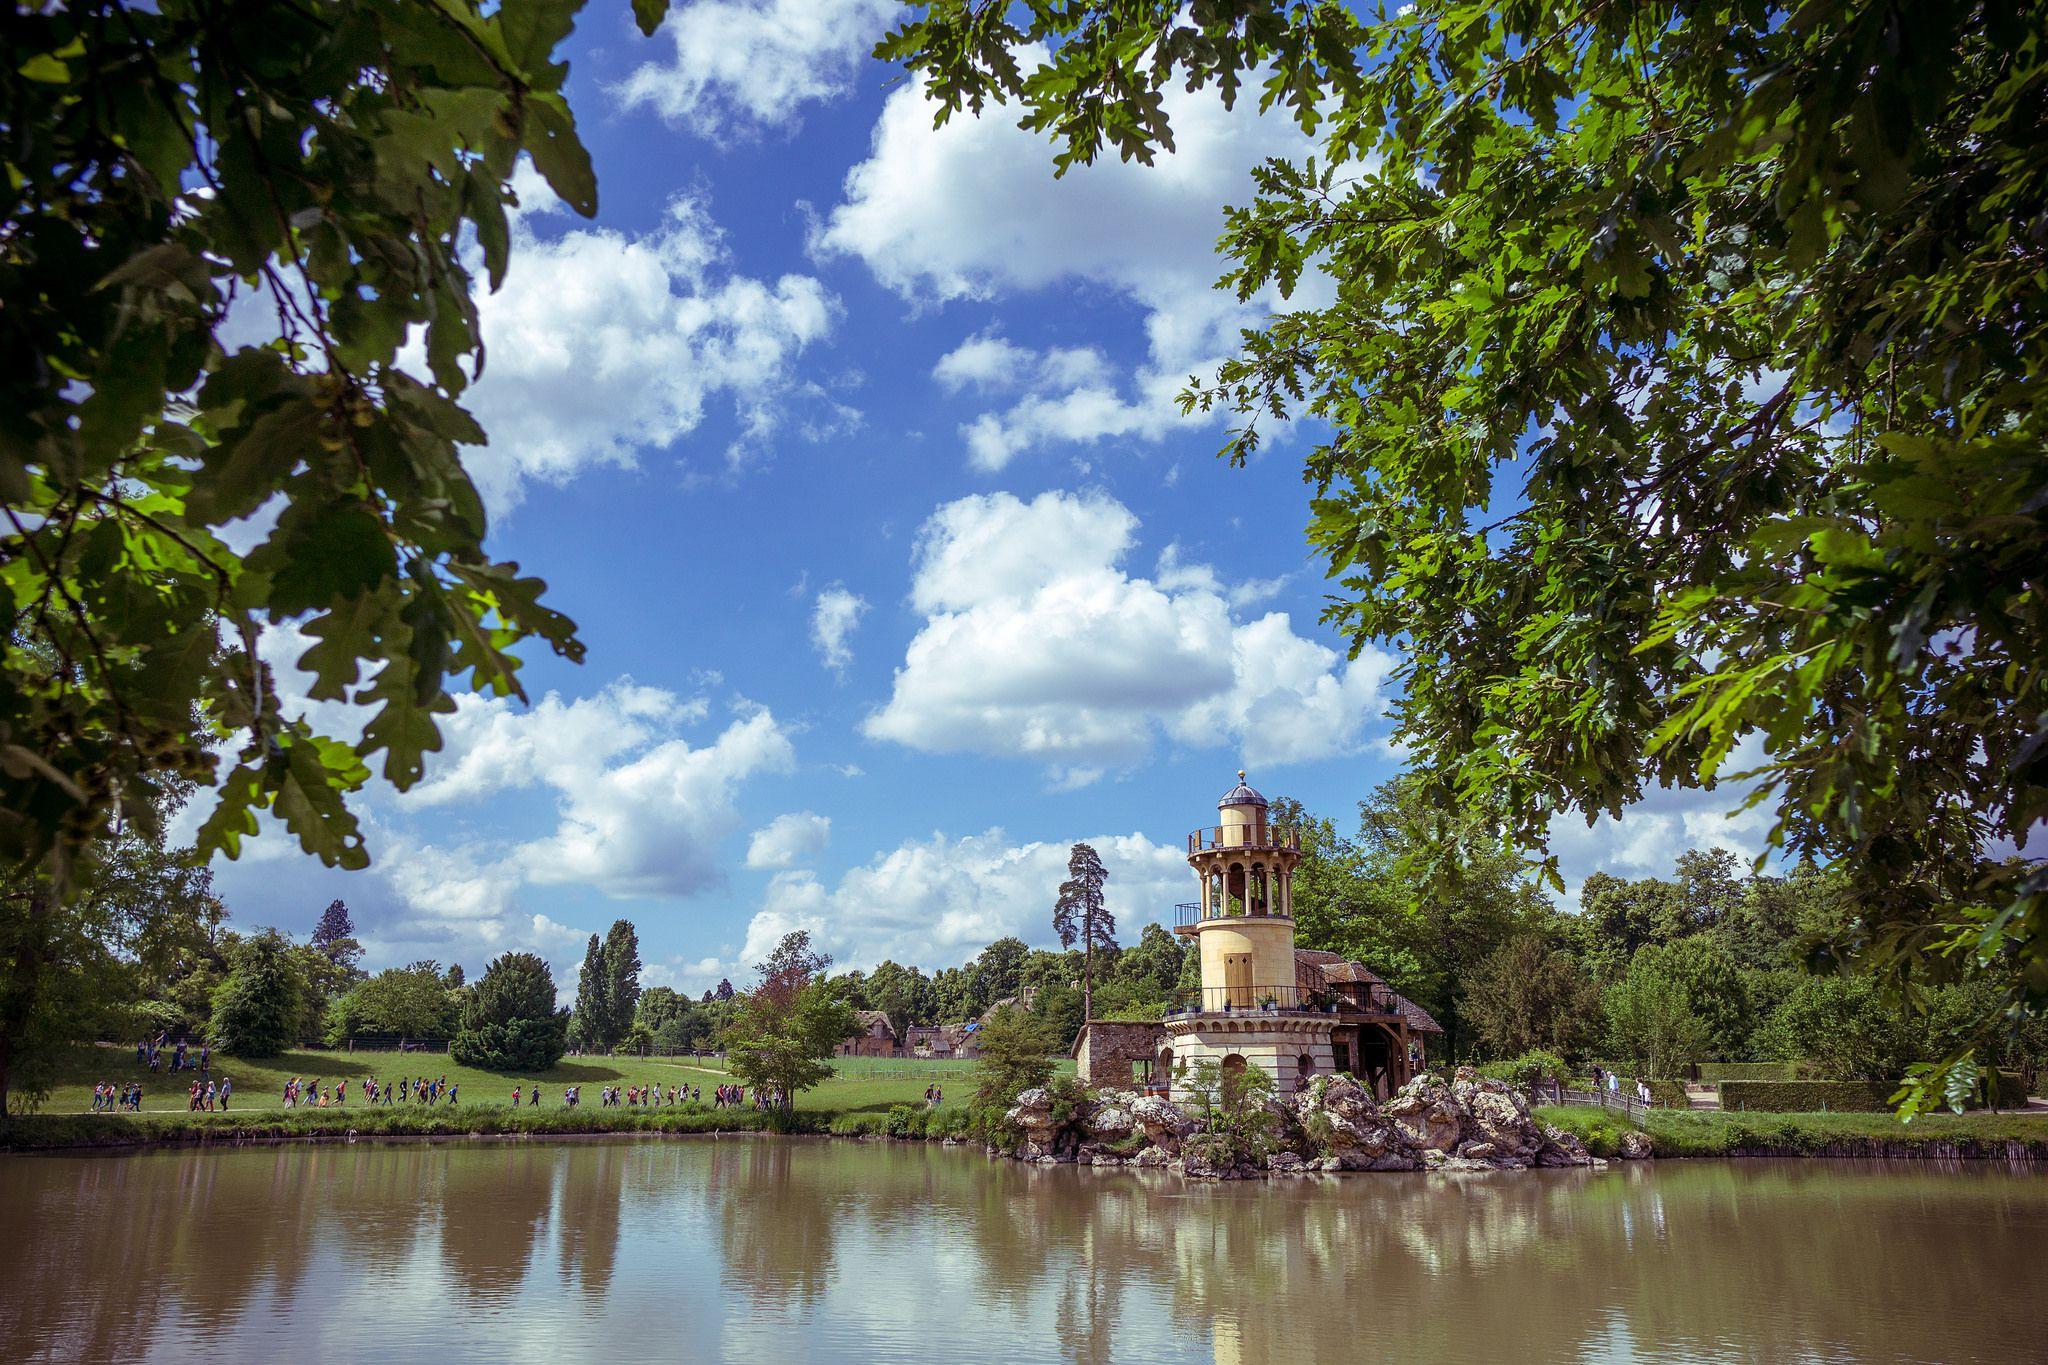 Obiective turistice din Paris - Versailles